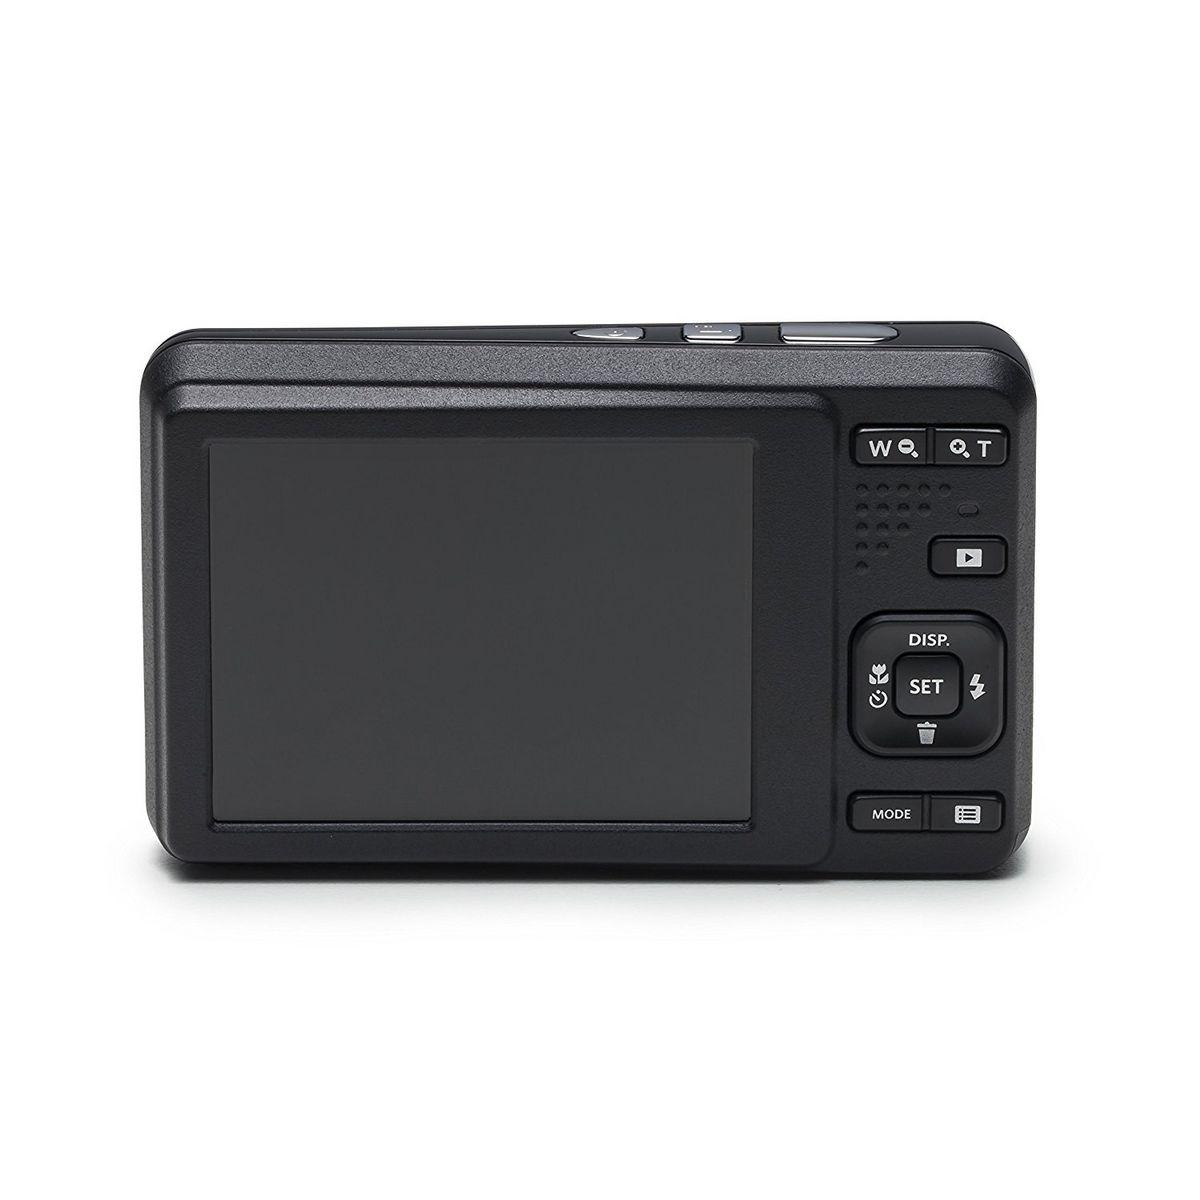 KODAK Appareil Photo Compact - PIXPRO X53 - Noir + Objectif 5.1-25.5 mm  + Etui